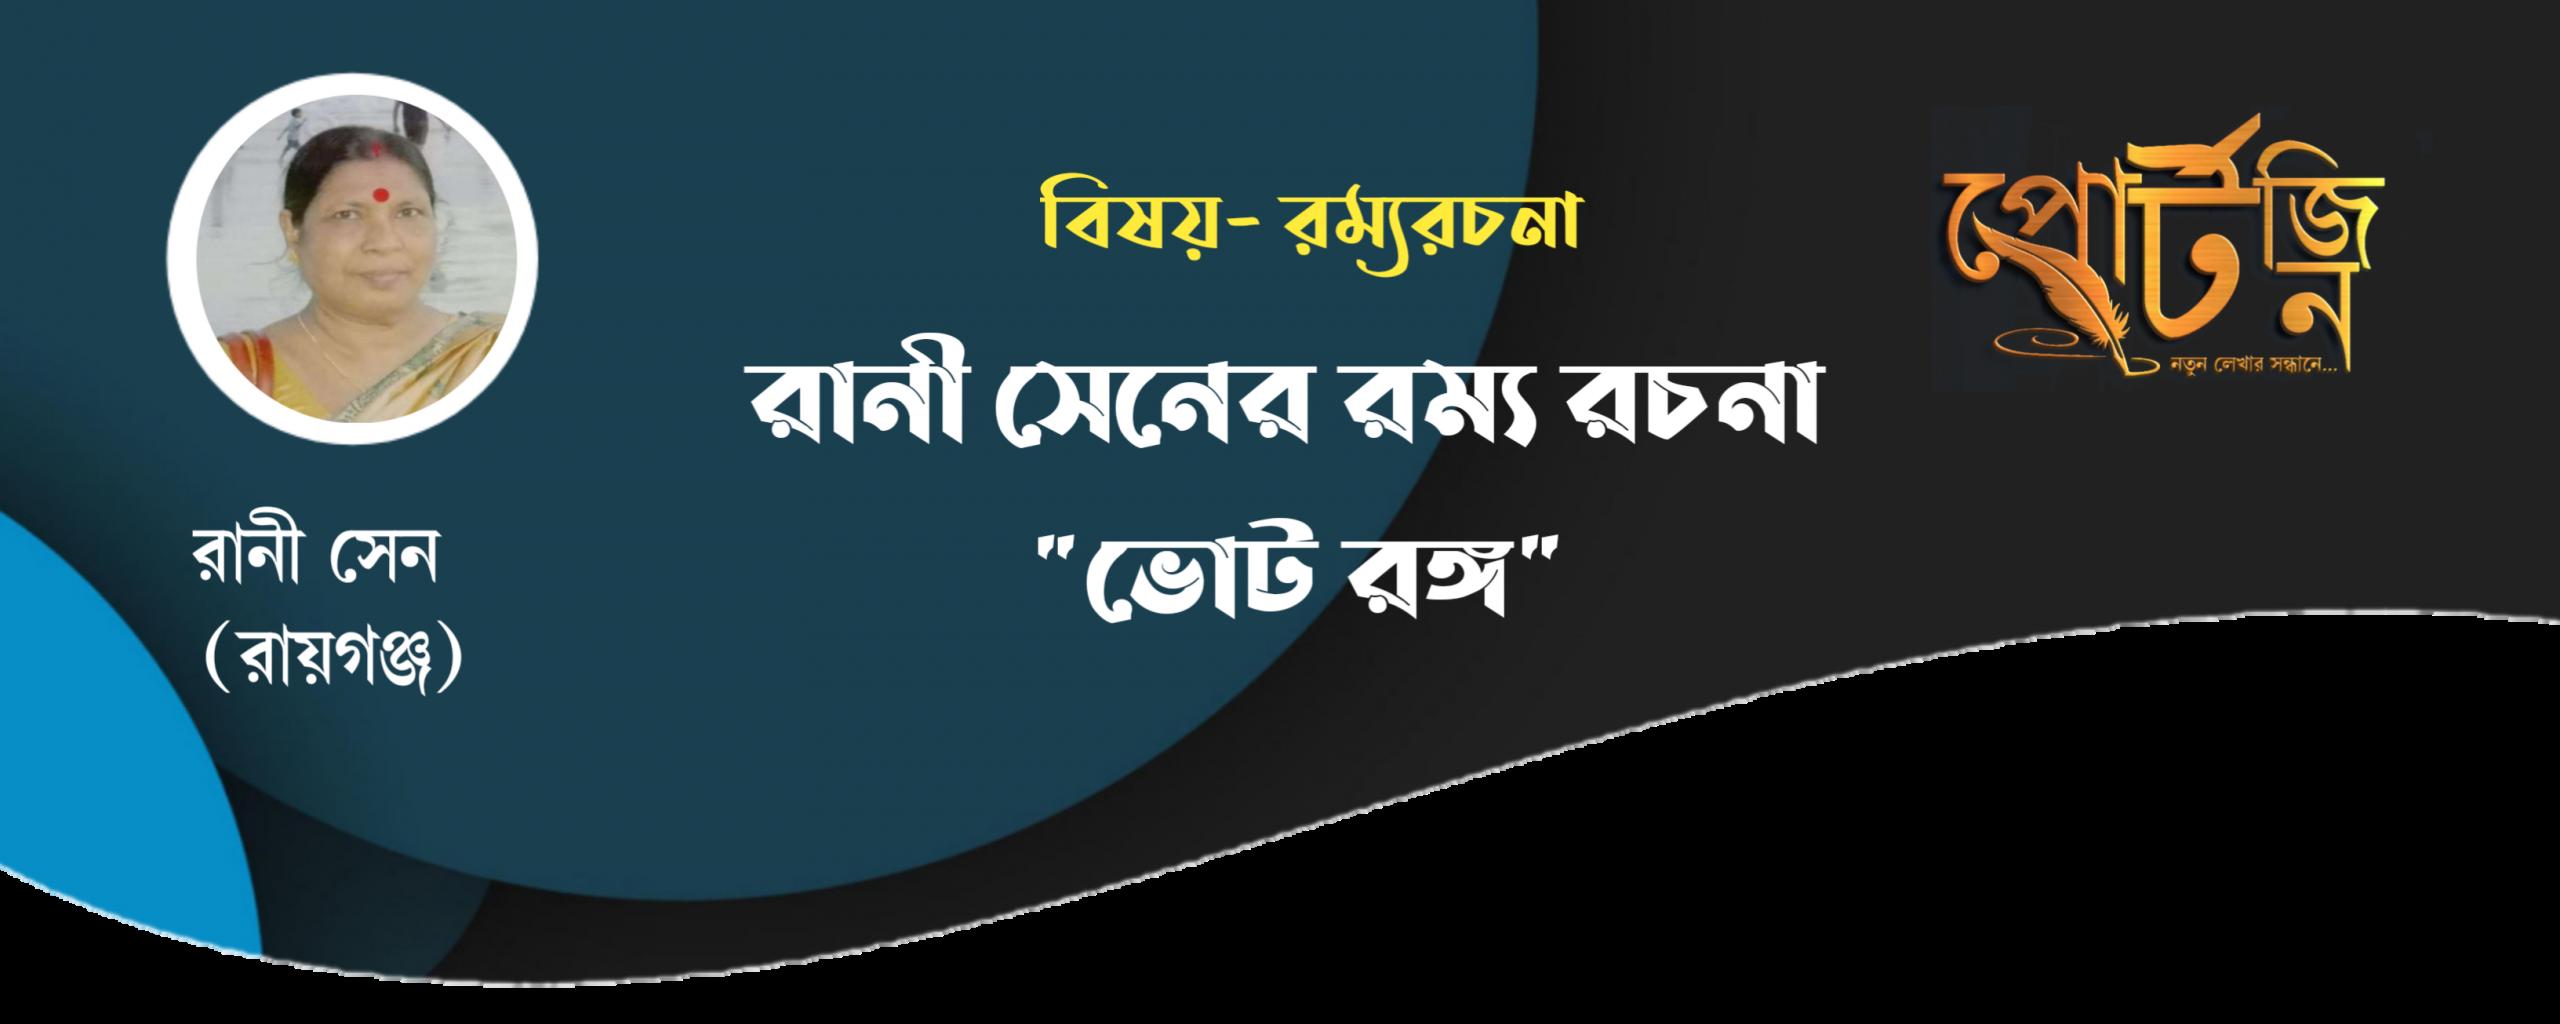 bangla golpo rani sen bengal live portzine